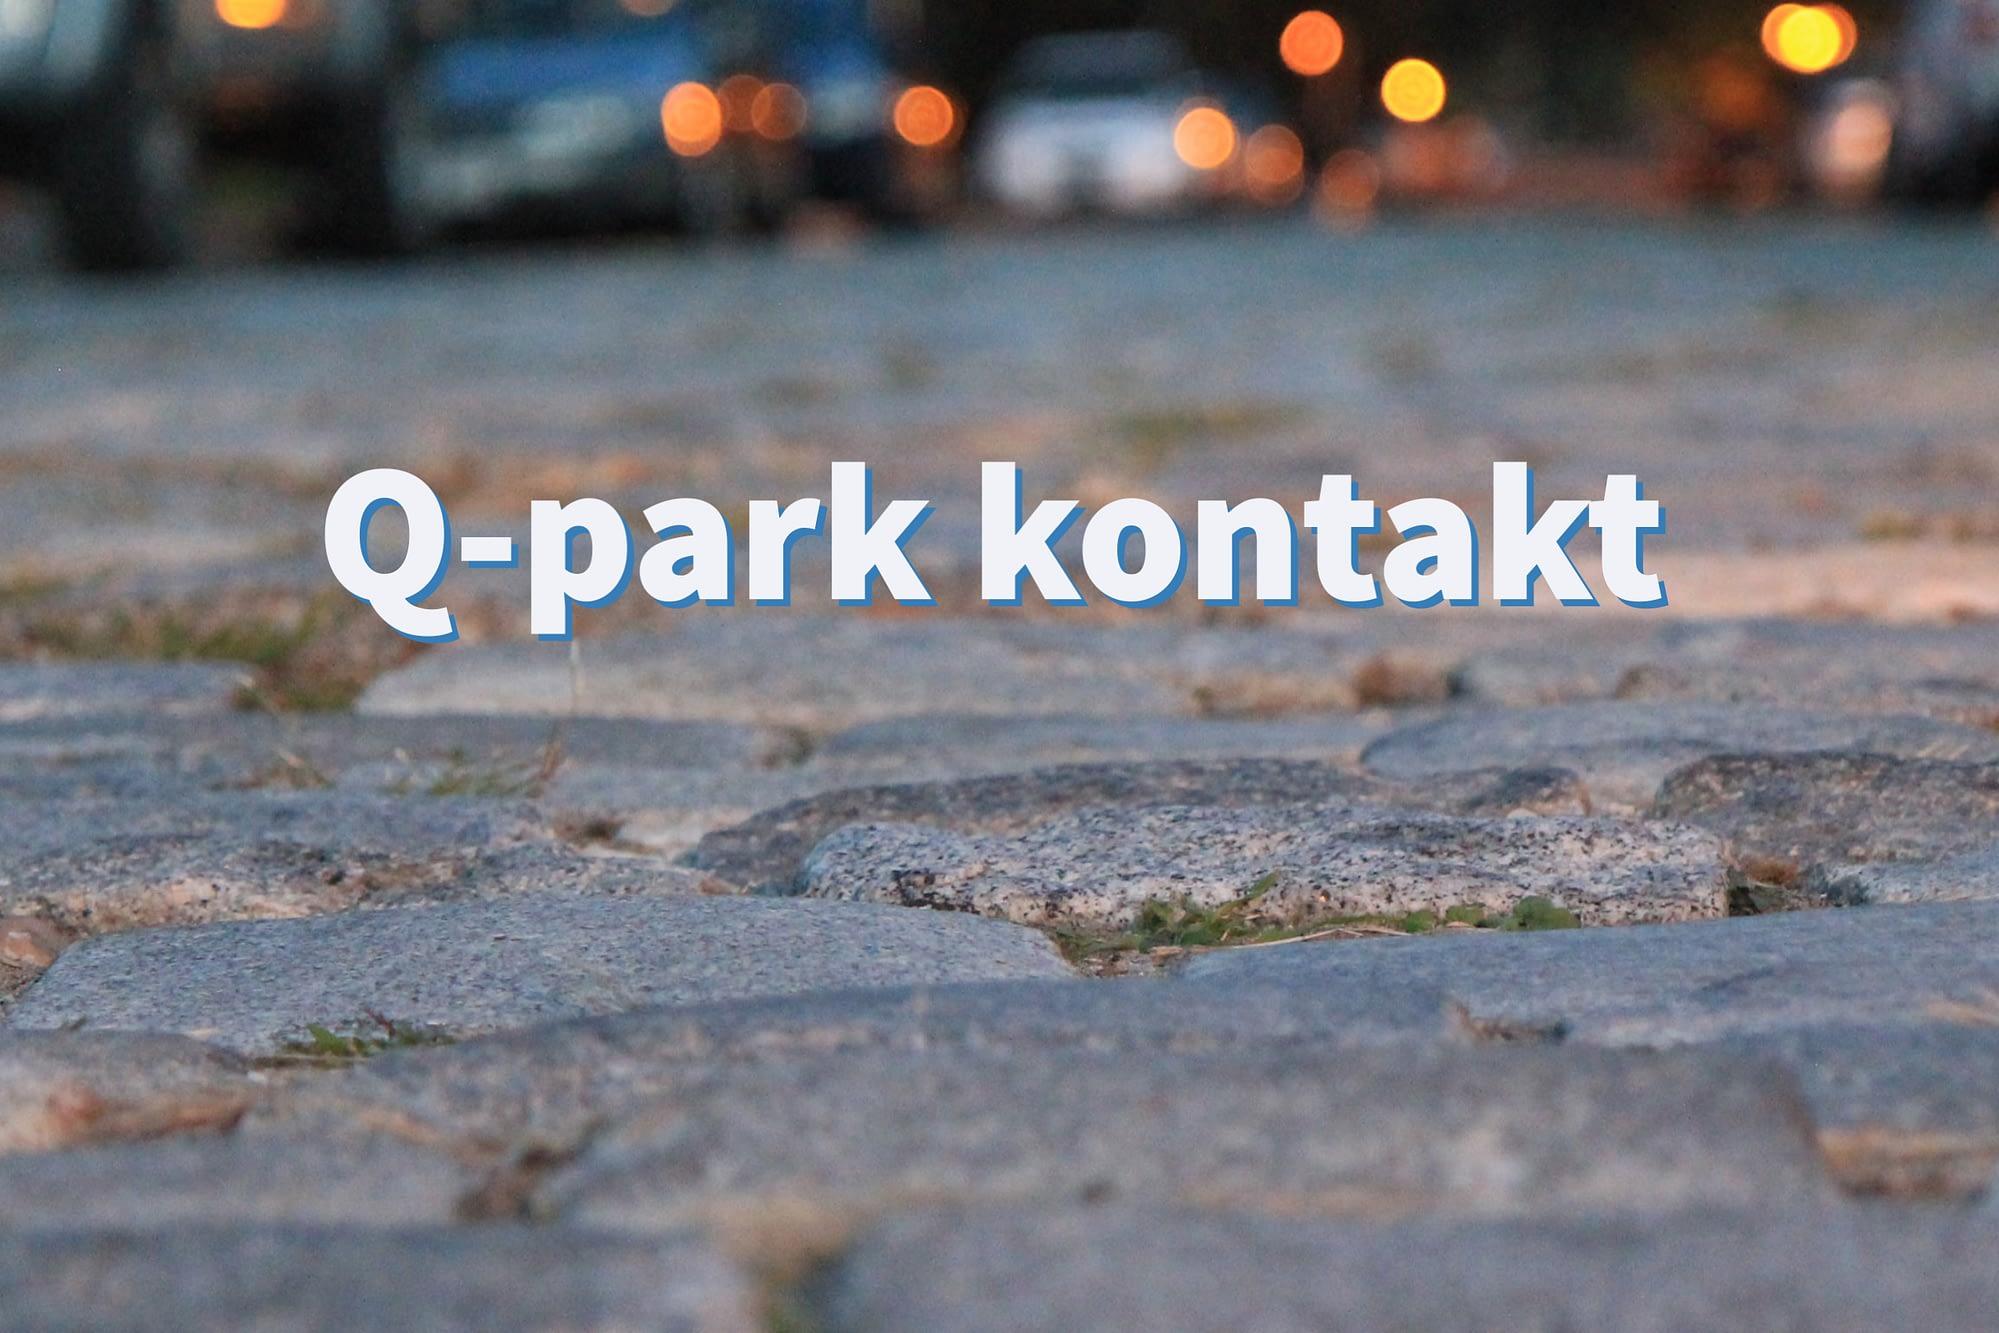 Q-park kontakt